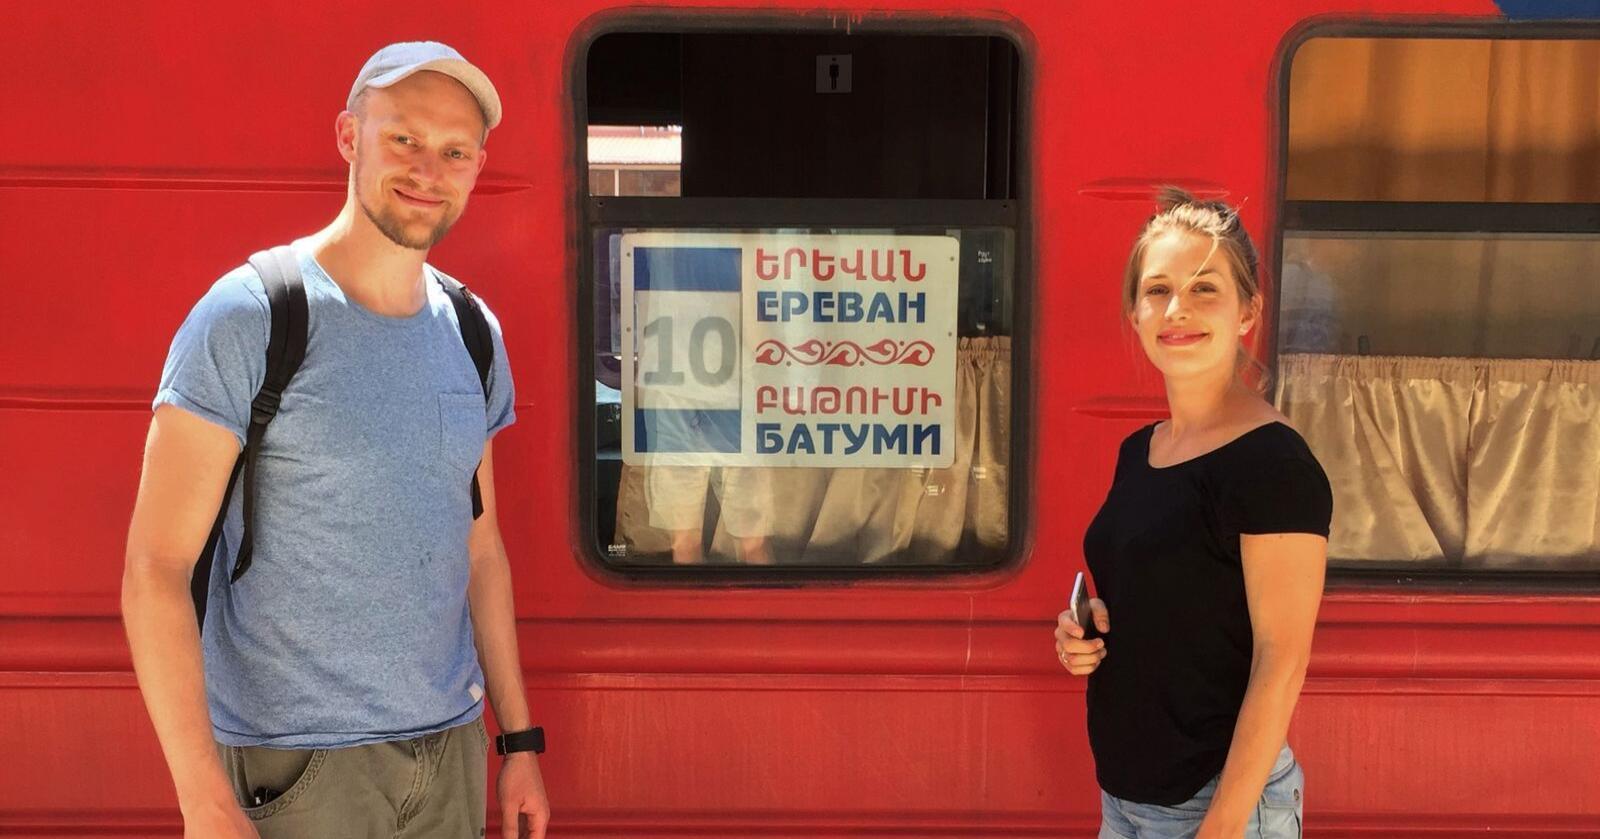 KAUKASUS: Erik Sveberg Dietrichs og samboeren Turid Austin Wæhler på togtur i Kaukasus. Foto: Privat